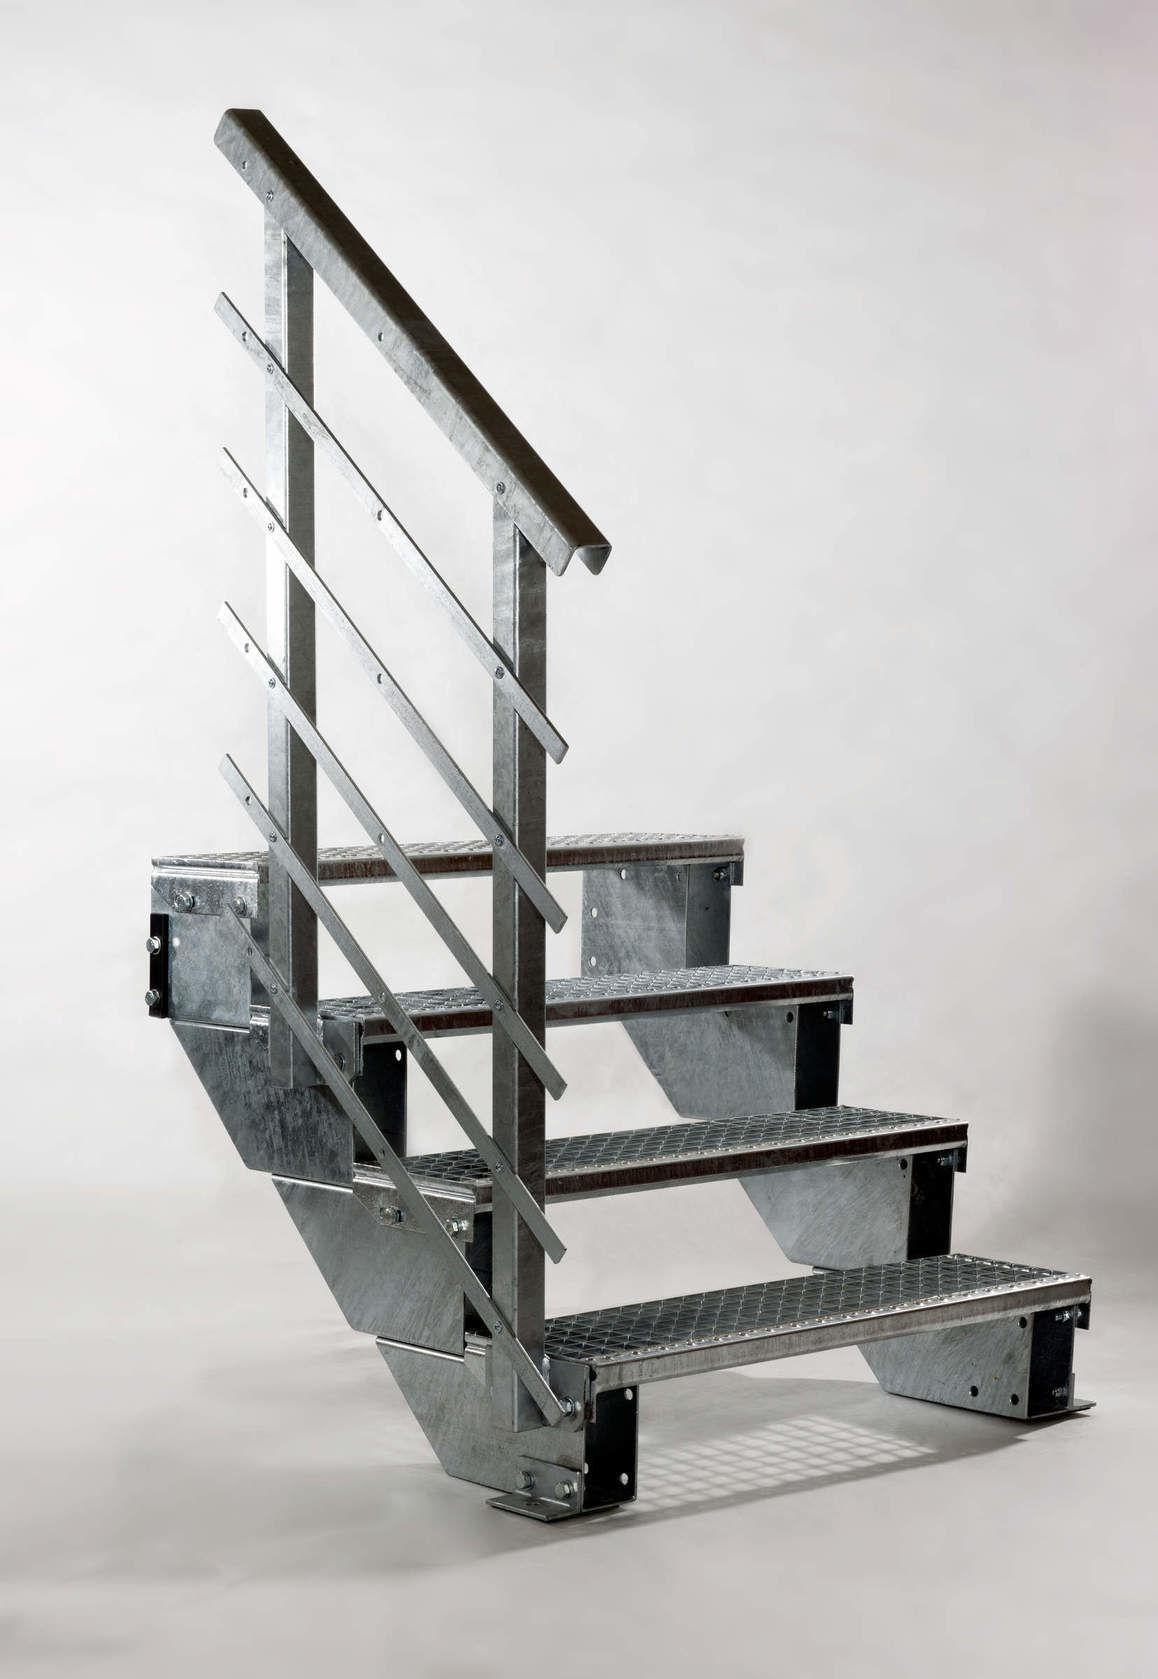 modultreppe der treppen bausatz f r heimwerker. Black Bedroom Furniture Sets. Home Design Ideas